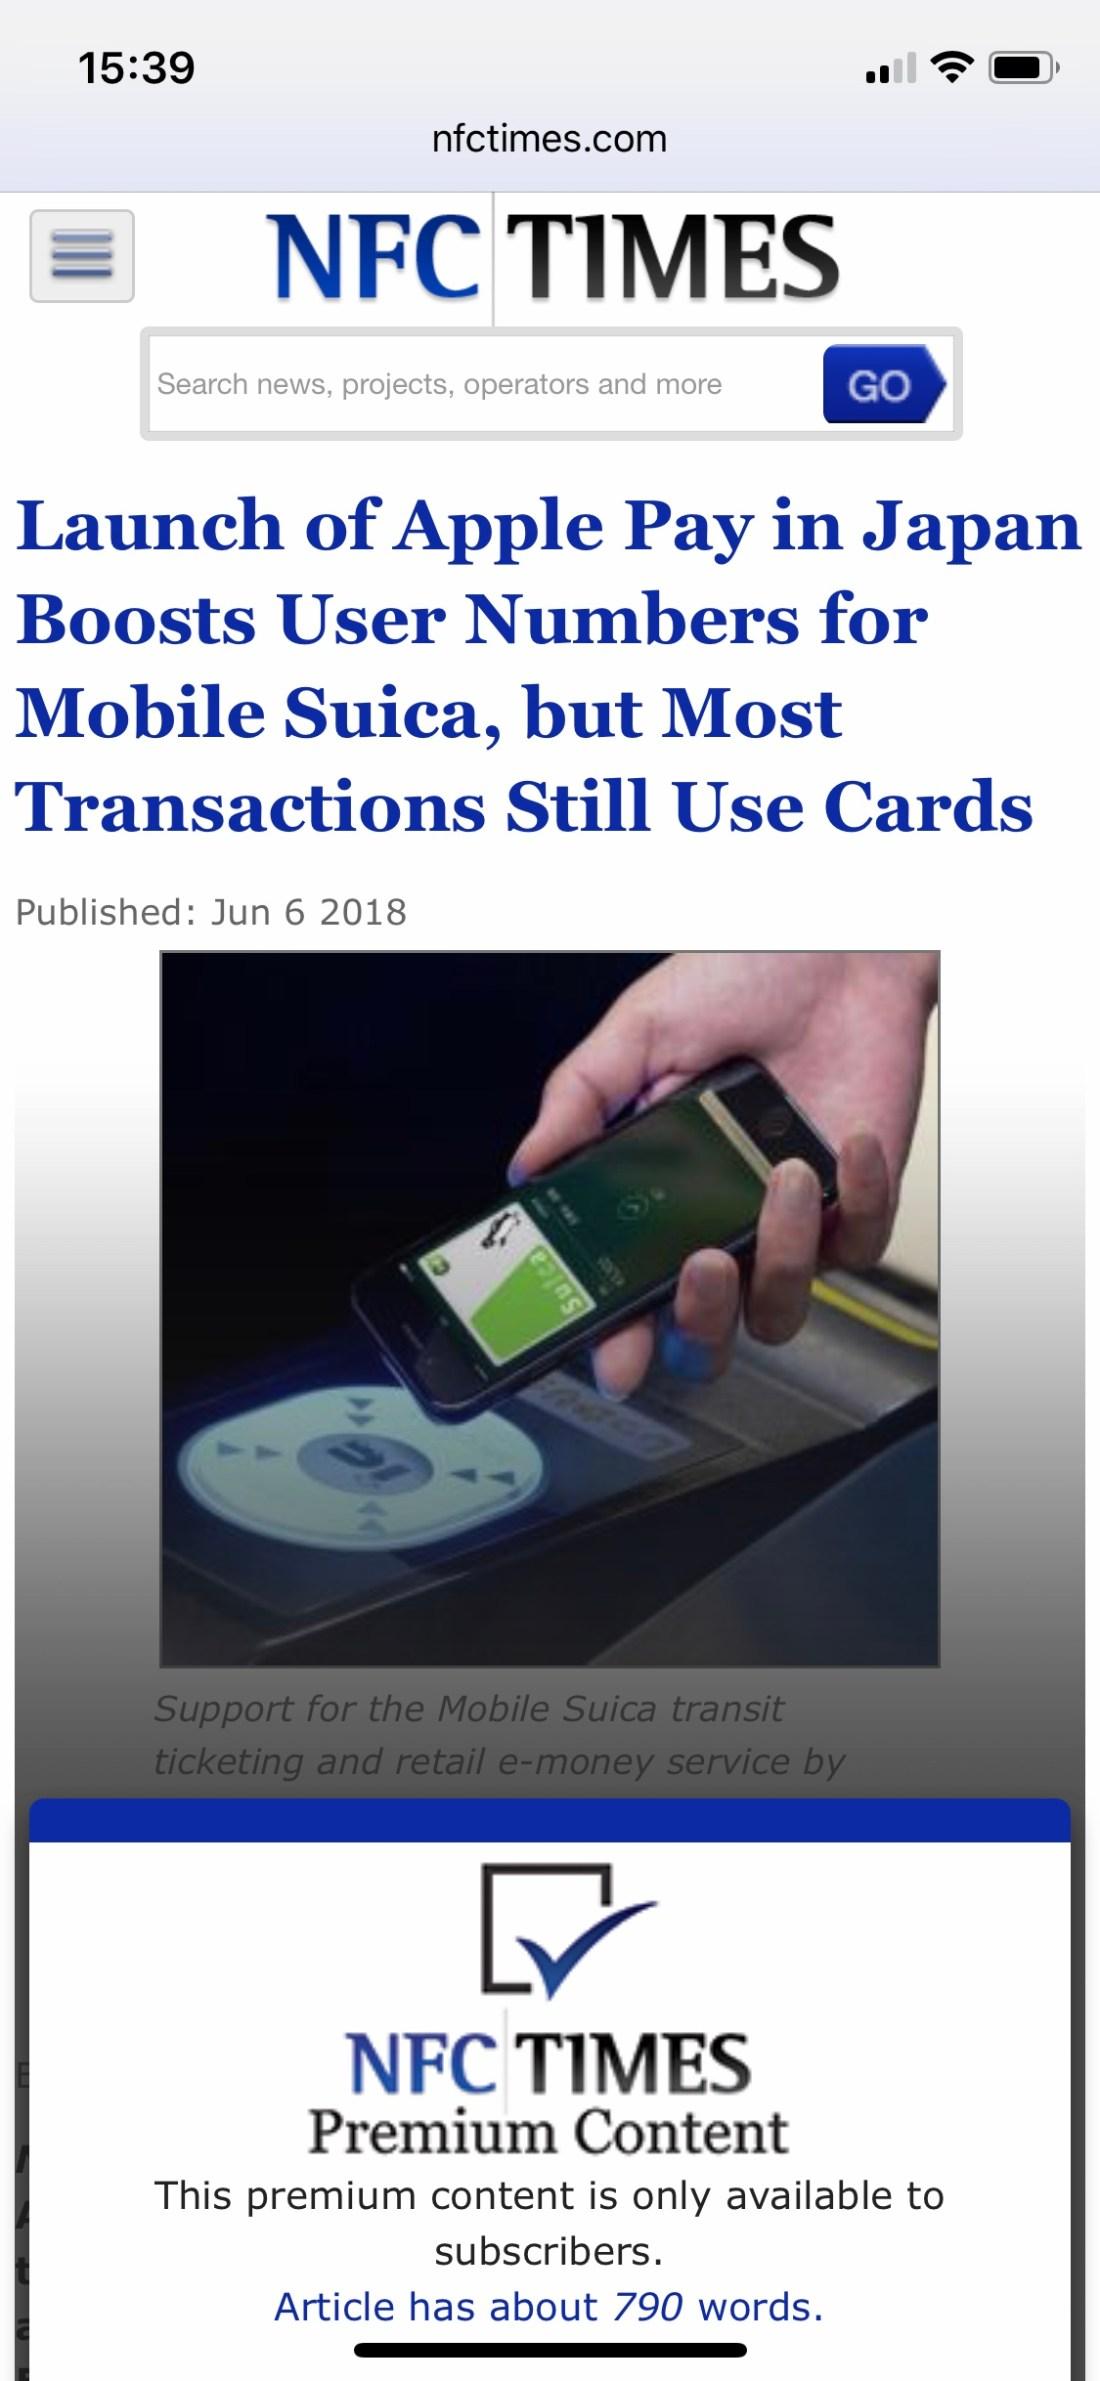 NFC TIMES Headline